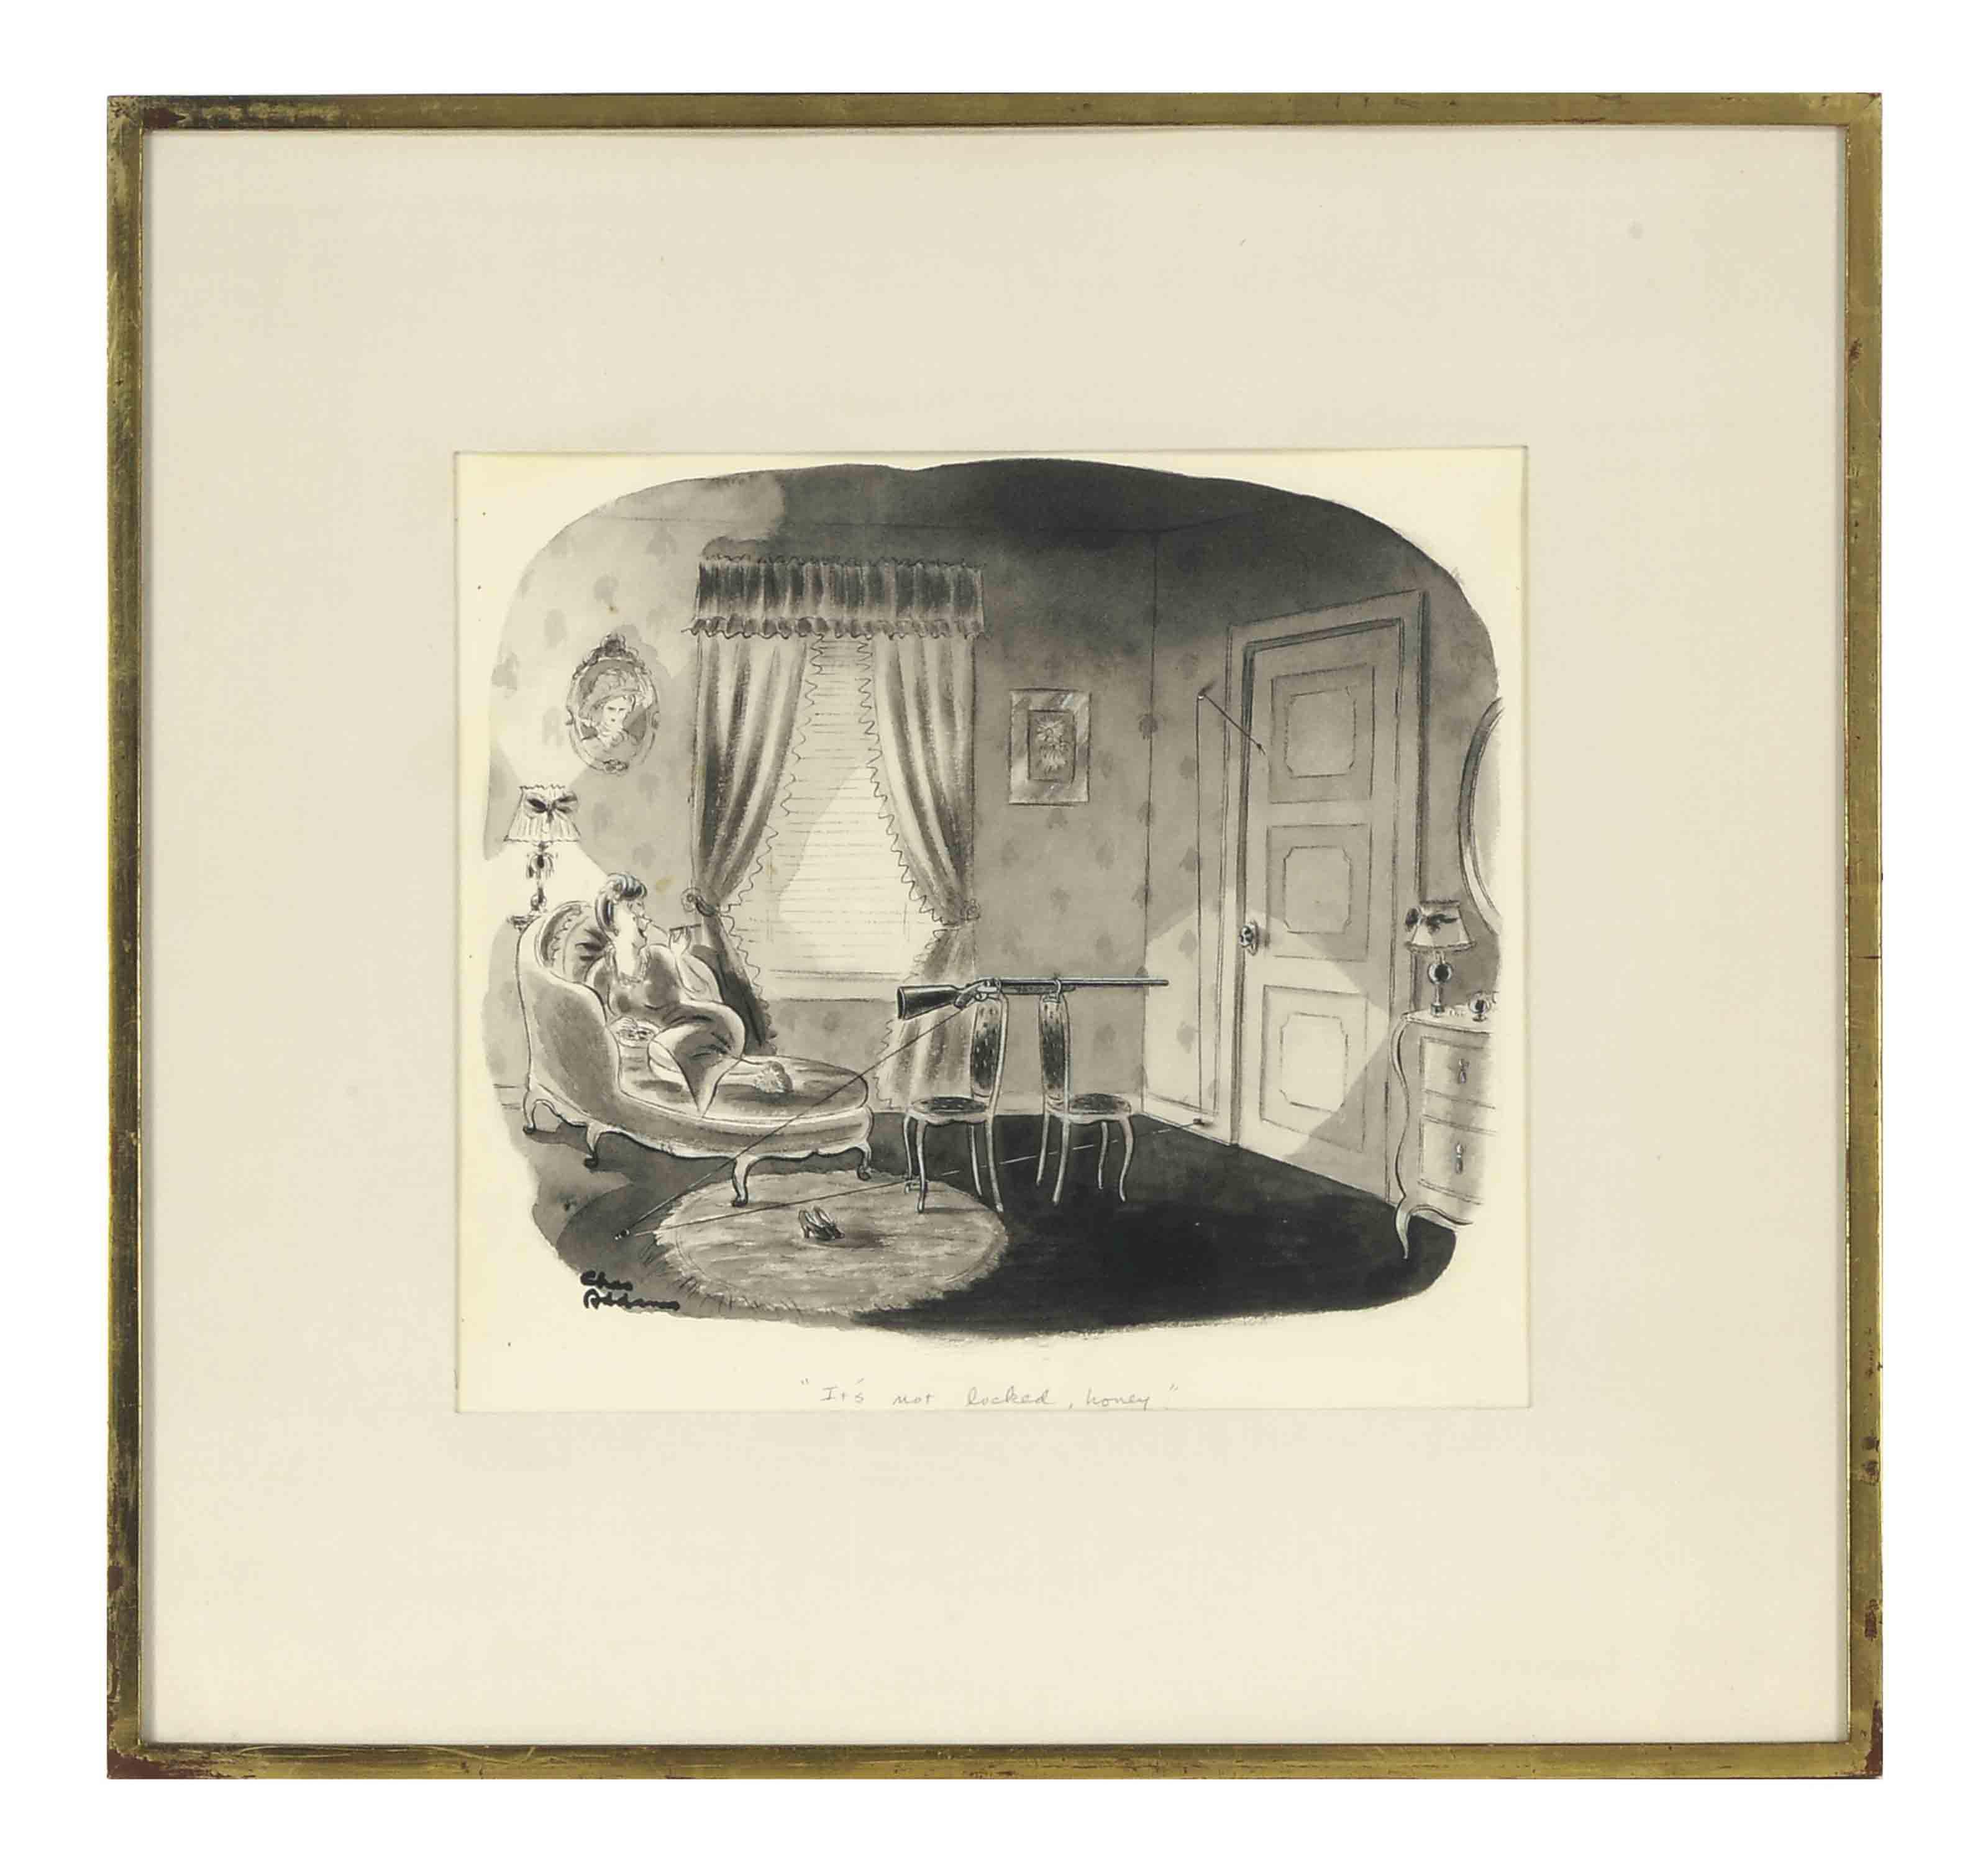 Charles Addams (AMERICAN, 1912